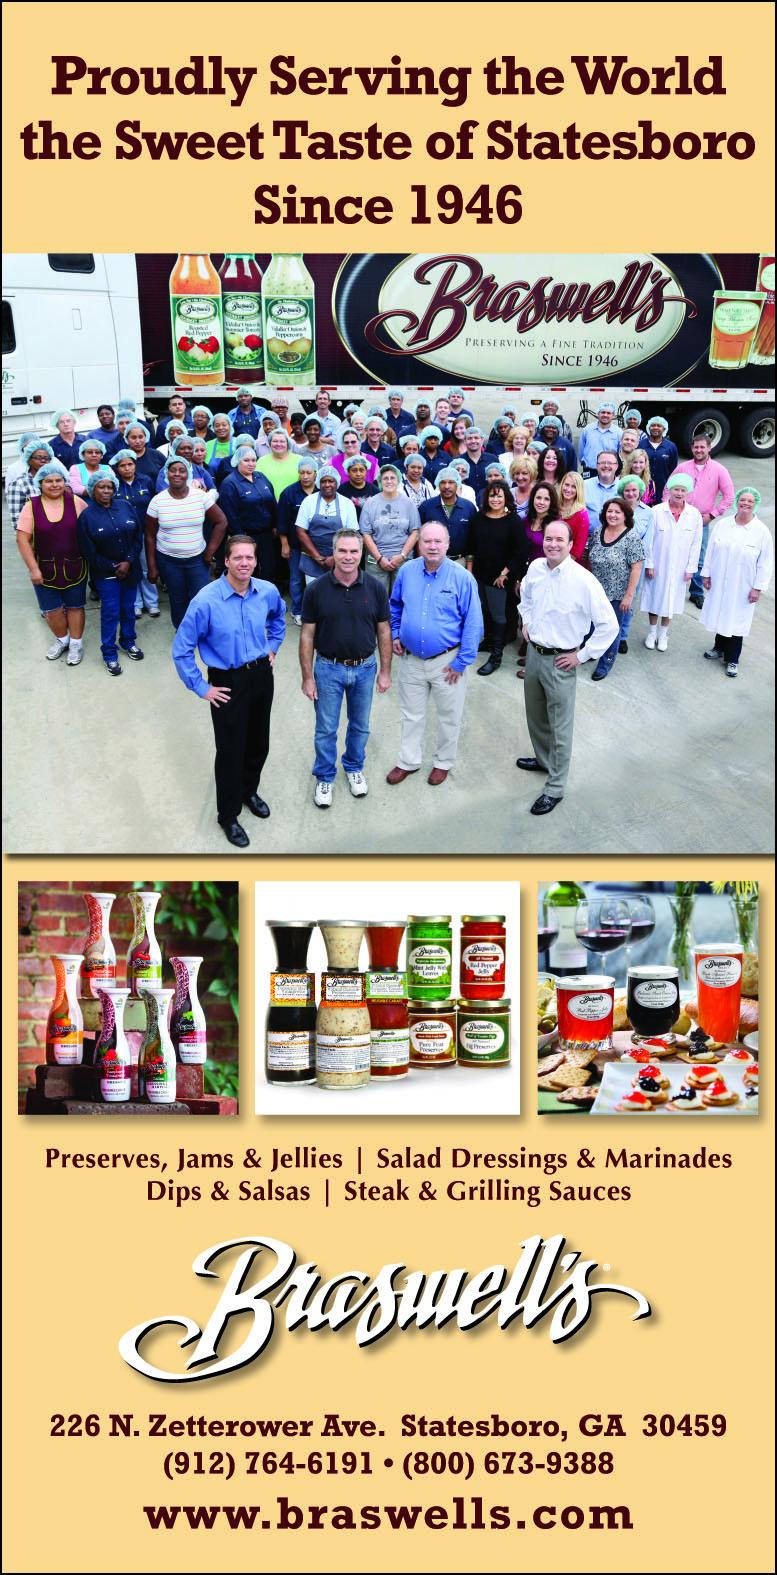 BraswellsStatesboroHerald2013Print.jpg